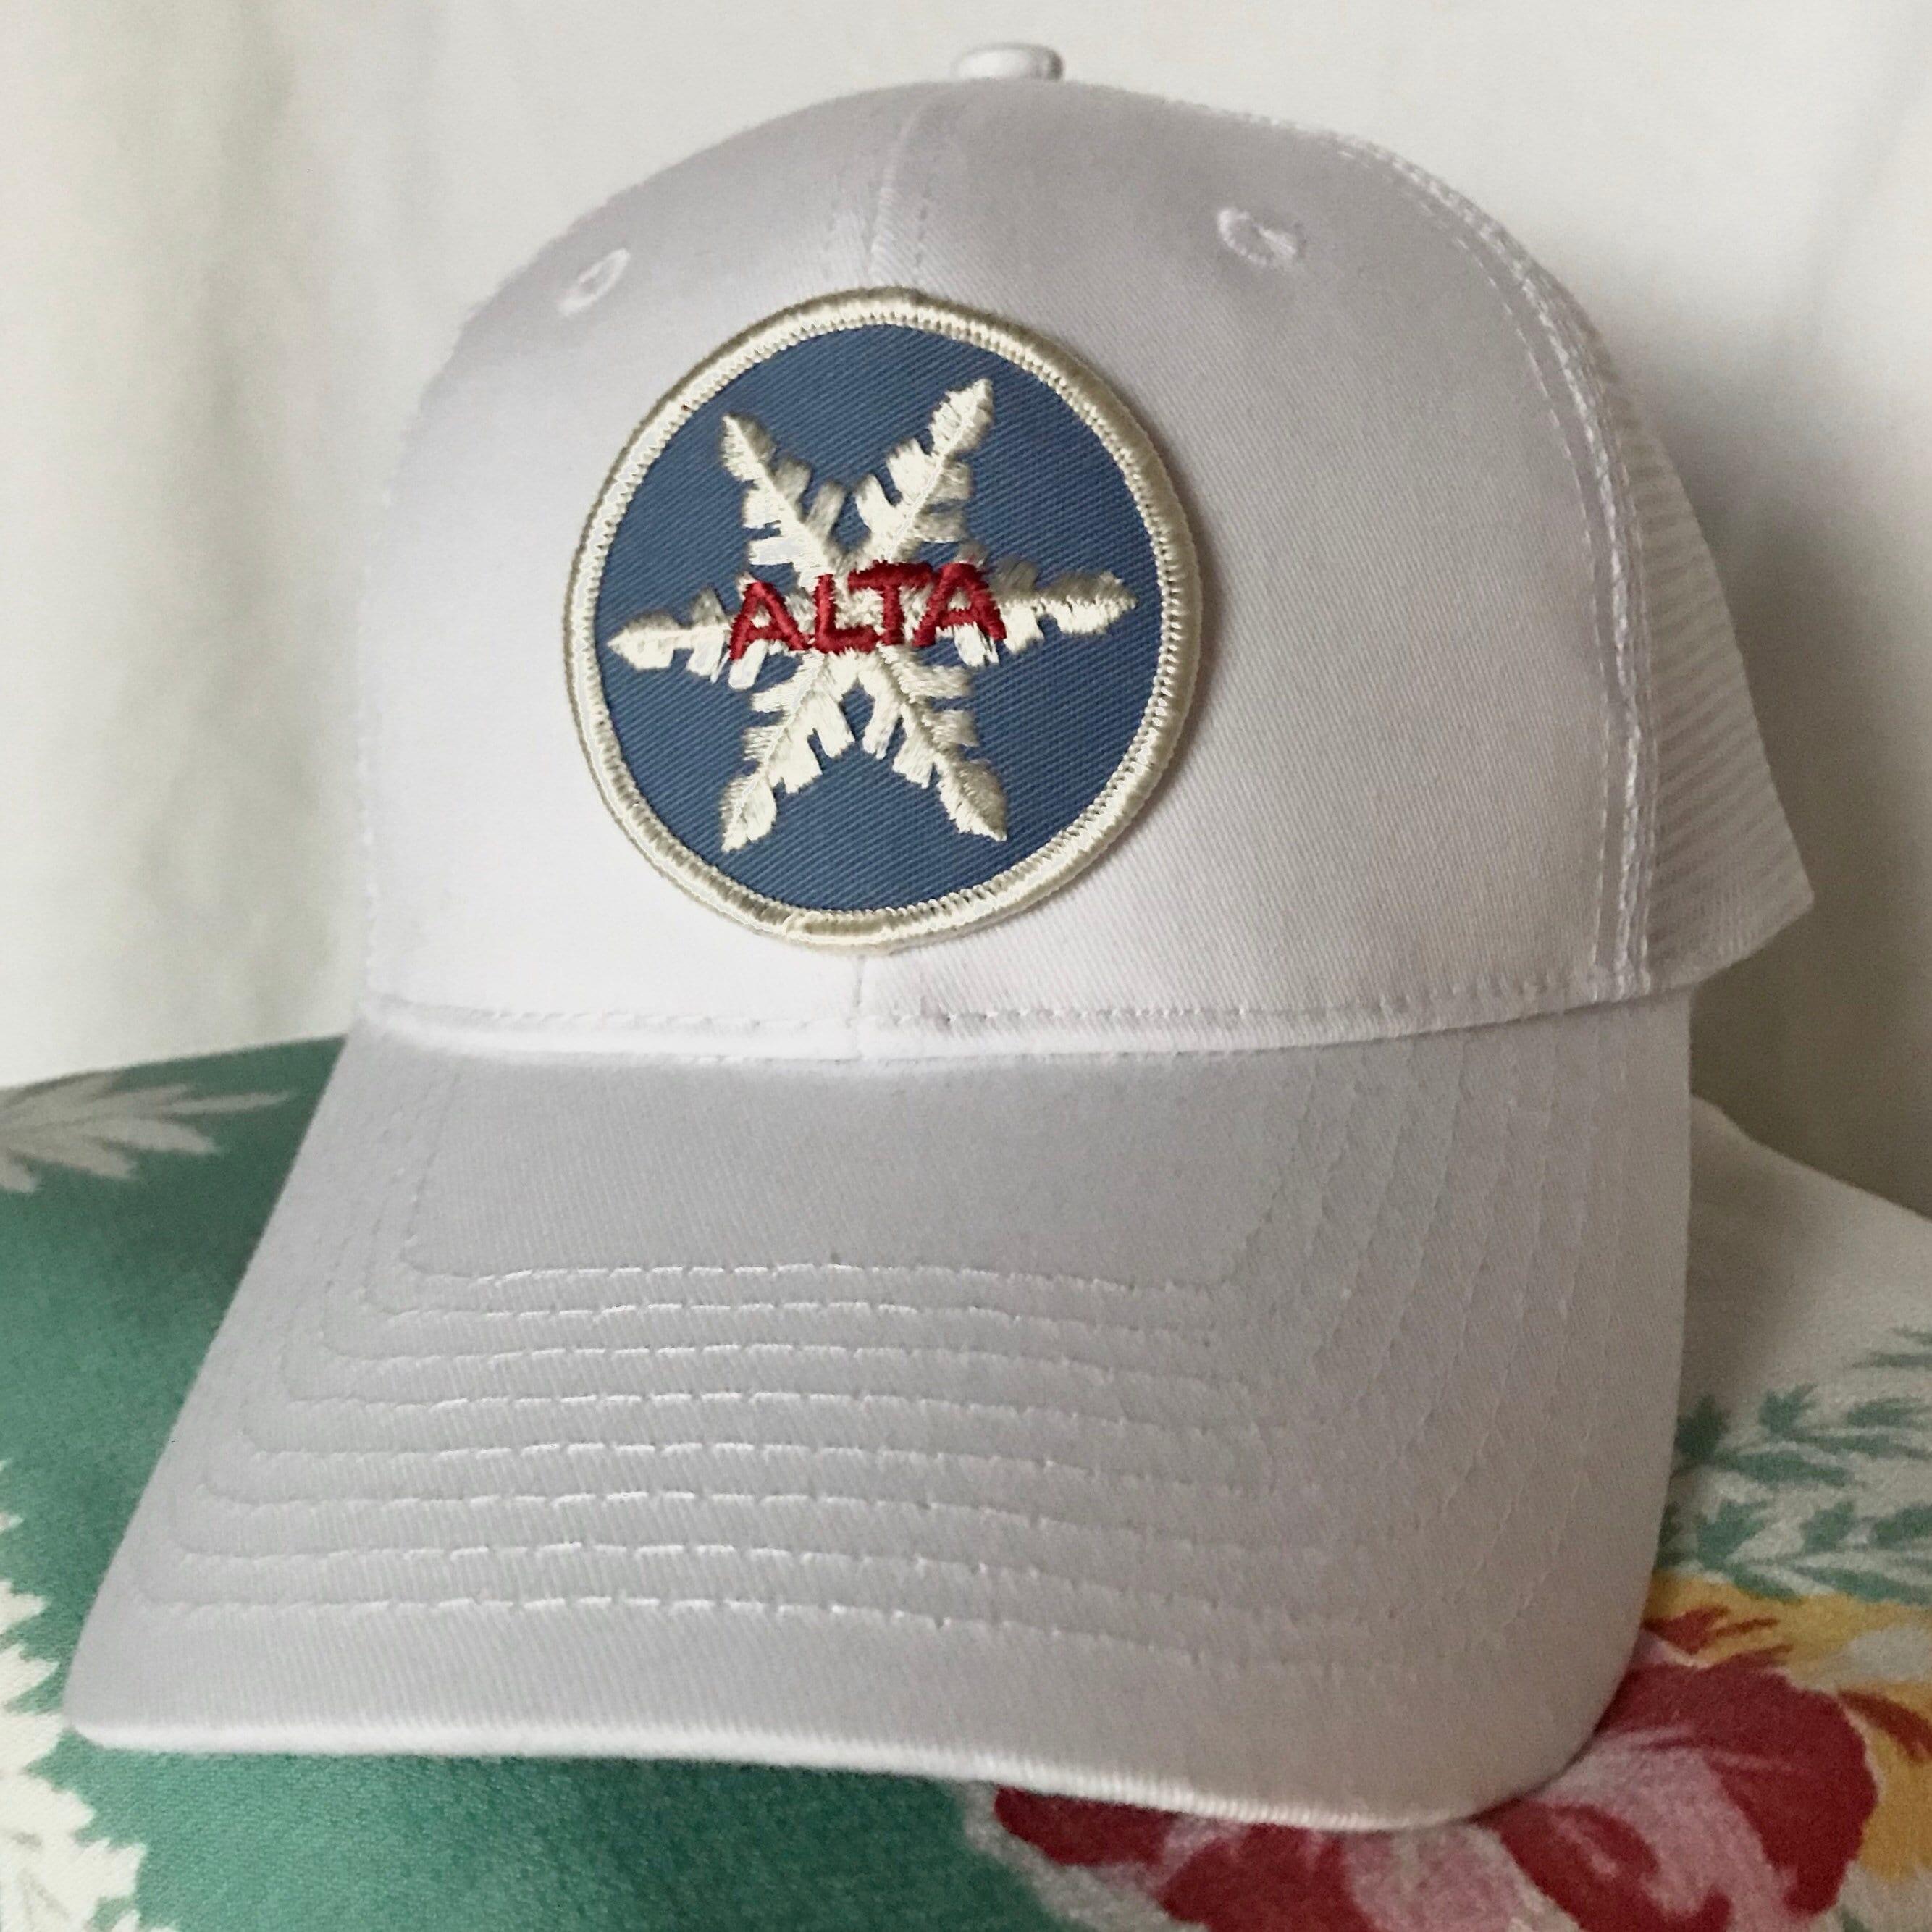 958d46d4657ab ... switzerland vintage alta ski patch new trucker baseball hat white ski  utah etsy 29857 71872